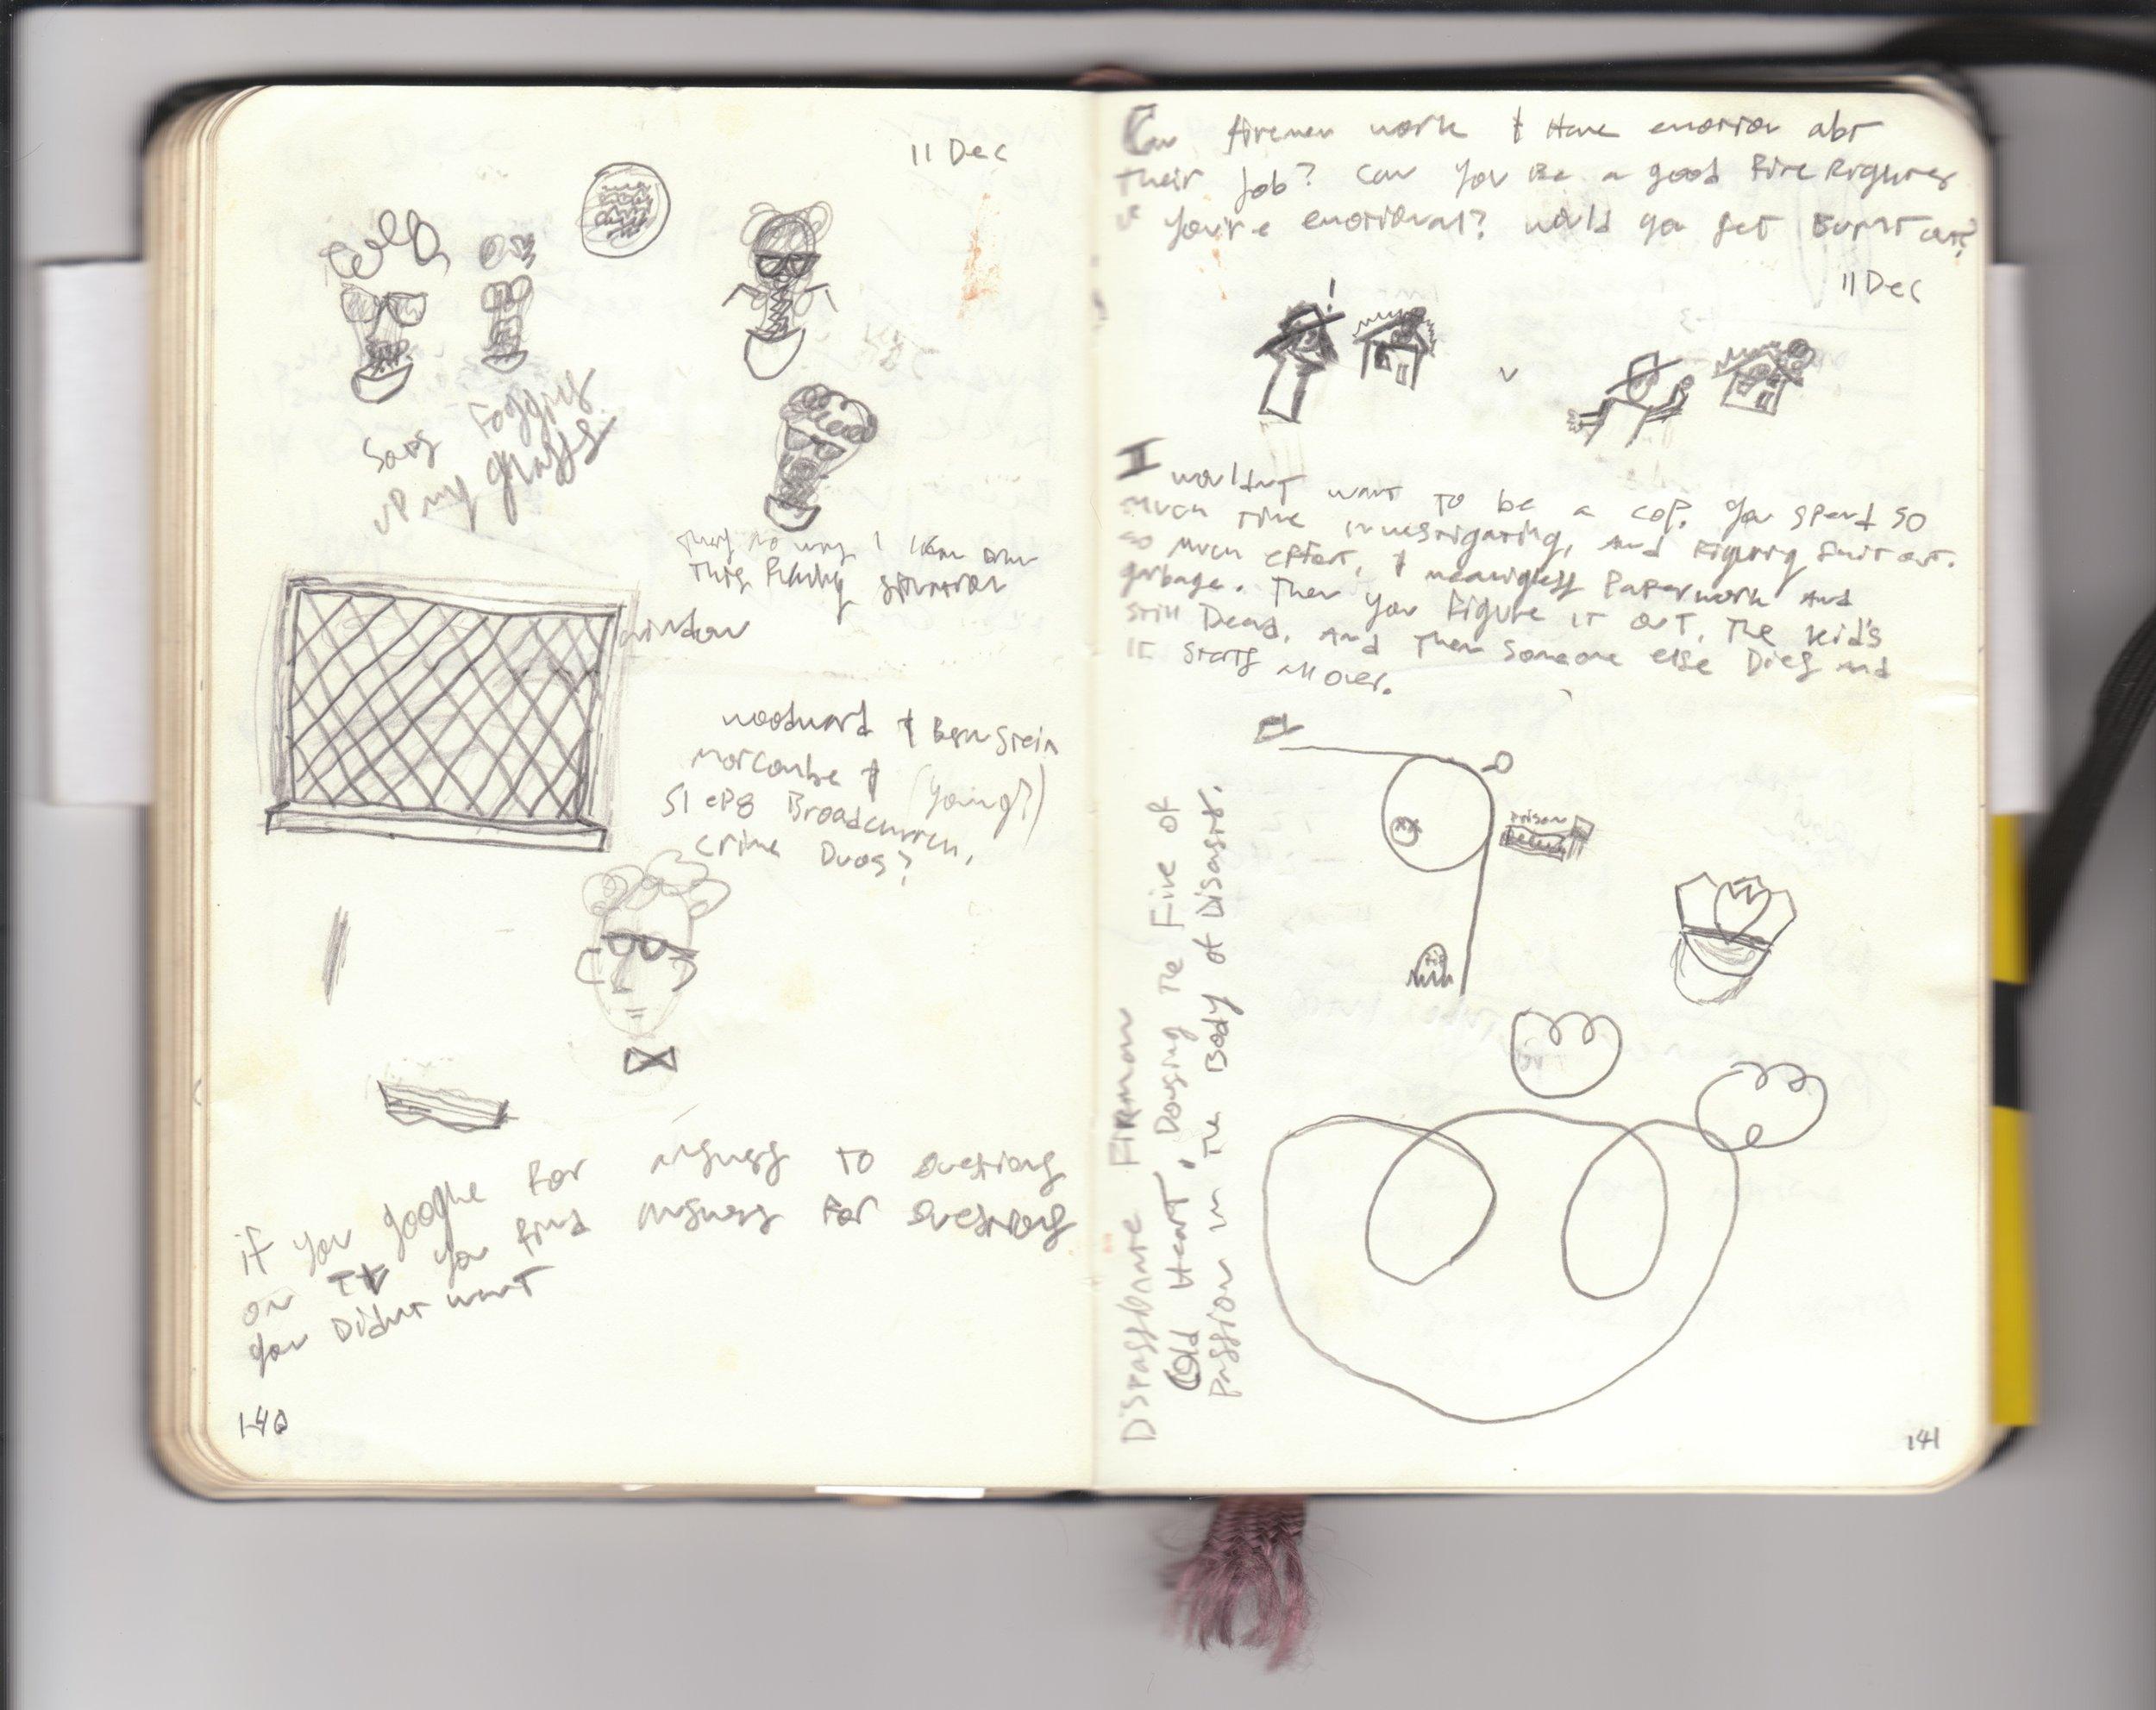 j7_Page_075.jpg